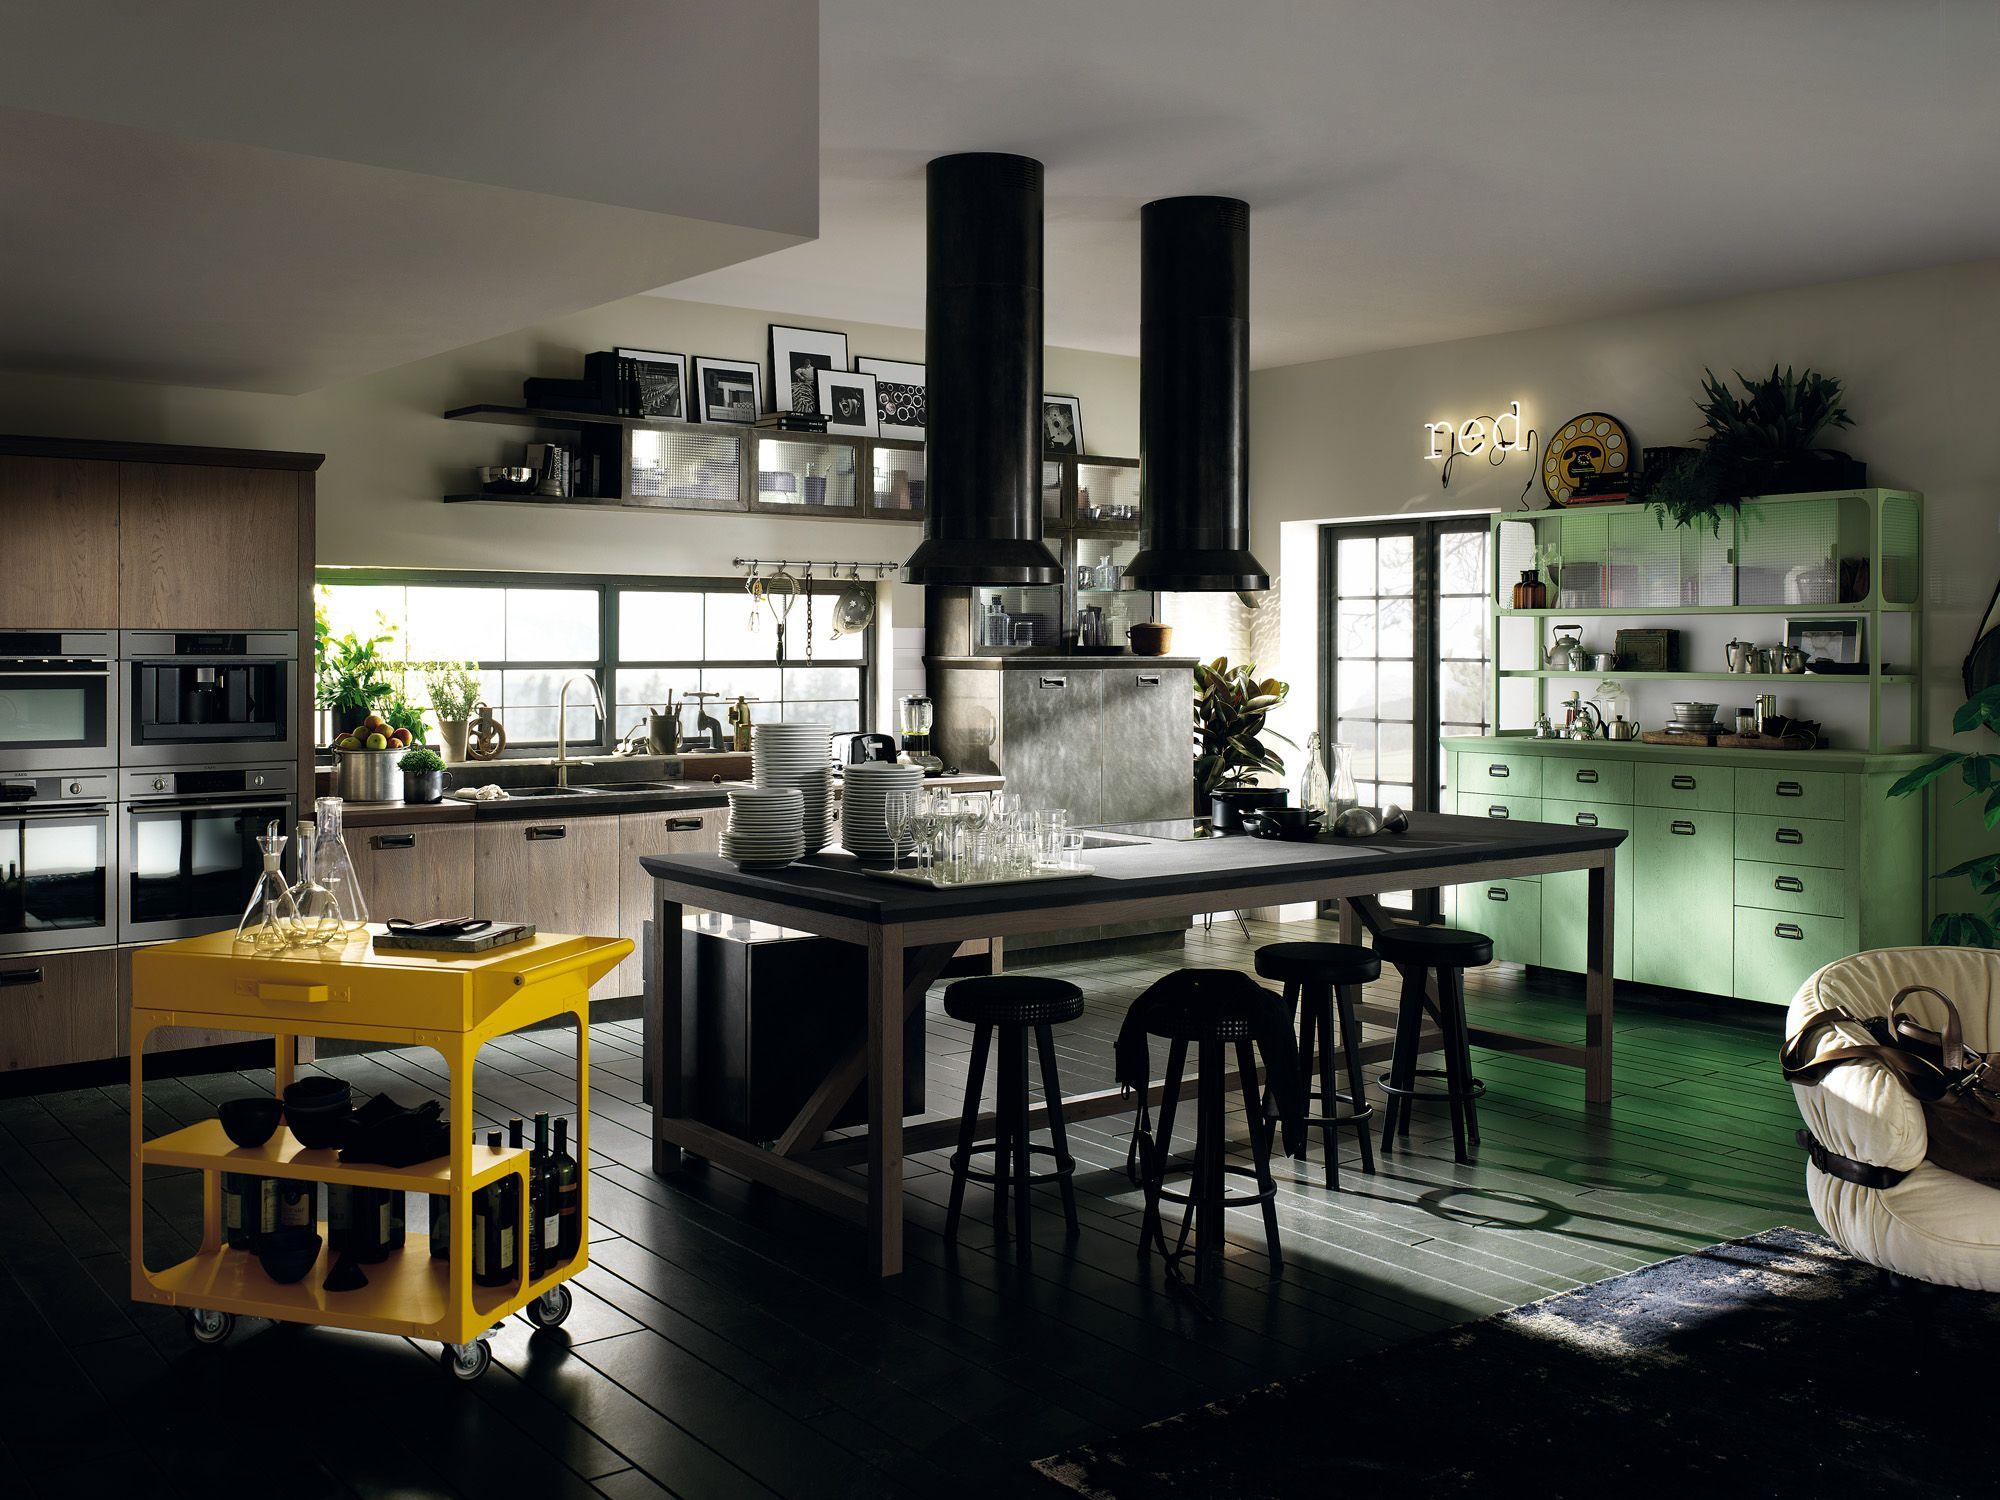 European Kitchen Brands Madeinitaly Brands For A Modern Kitchen Diesels Style Joins